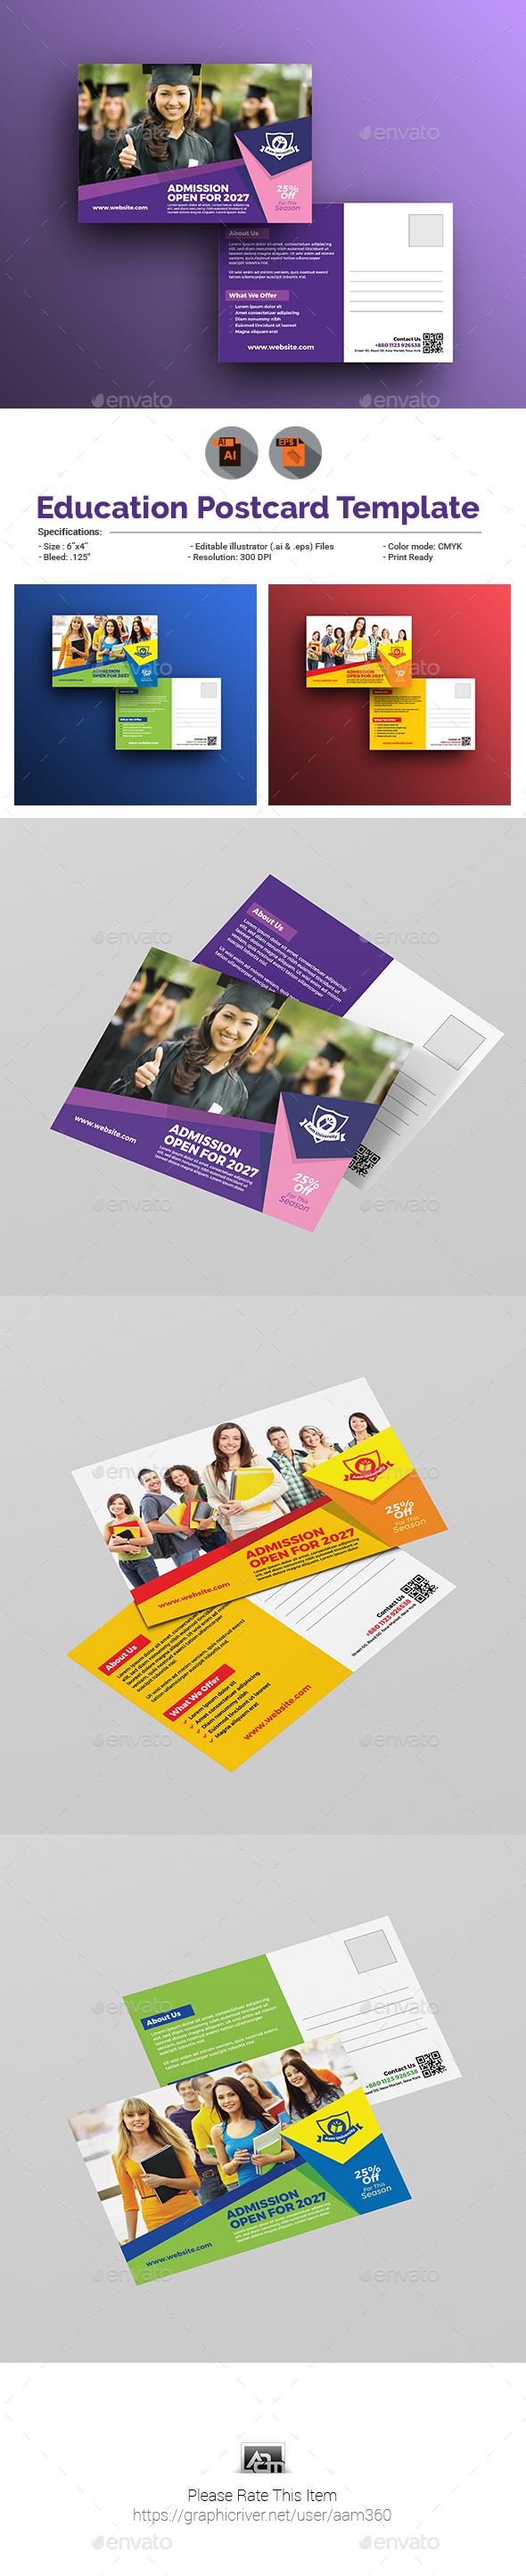 Junior School Postcard Template - Cards & Invites Print Templates